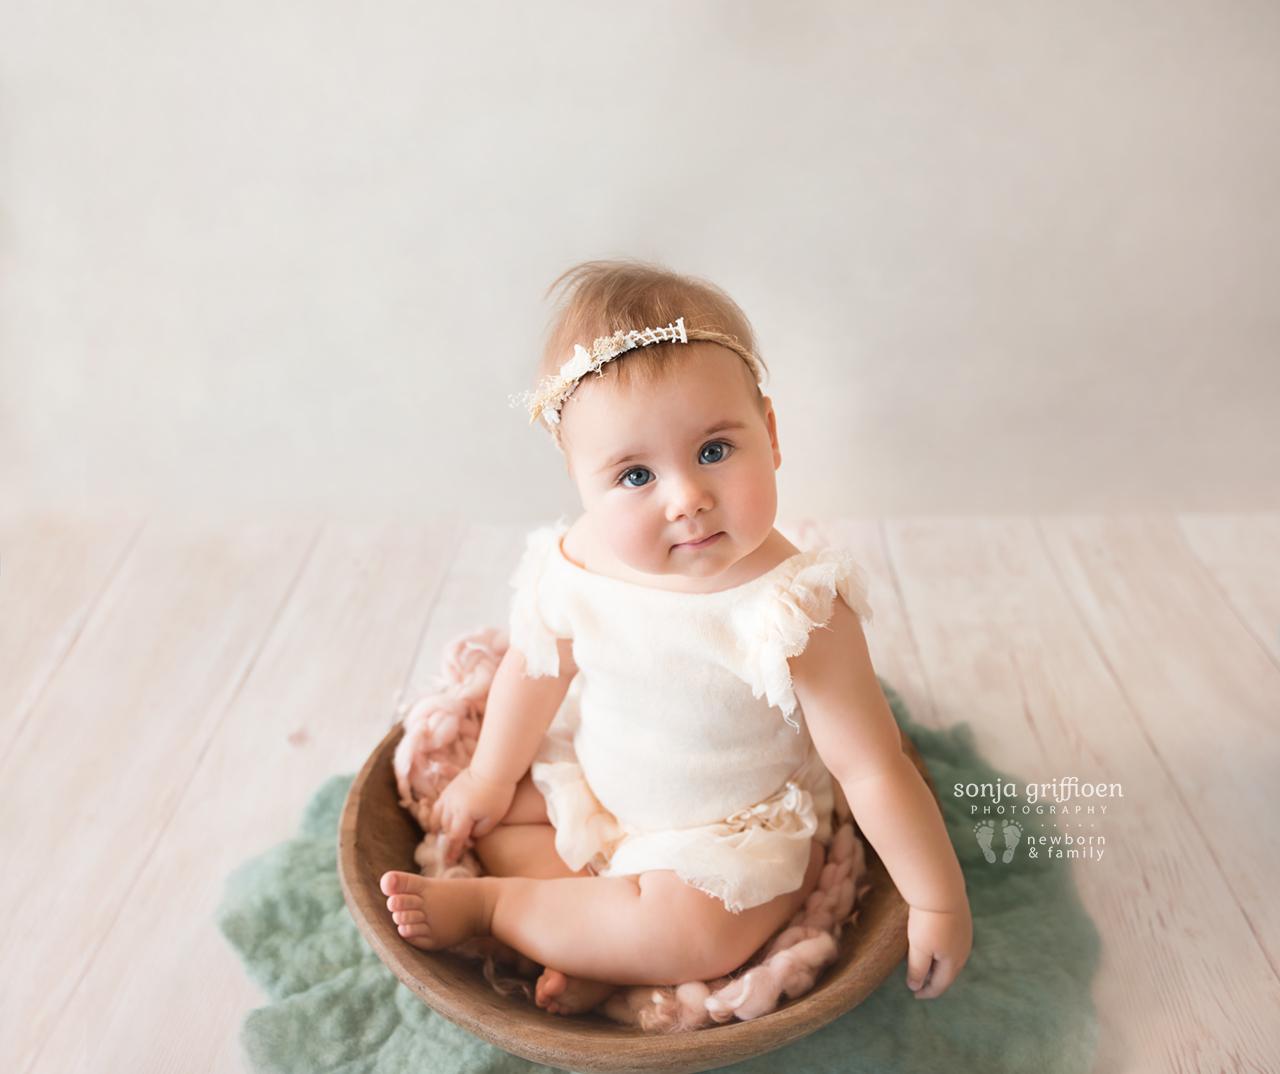 Thalia-Milestone-Brisbane-Newborn-Photographer-Sonja-Griffioen-09.jpg